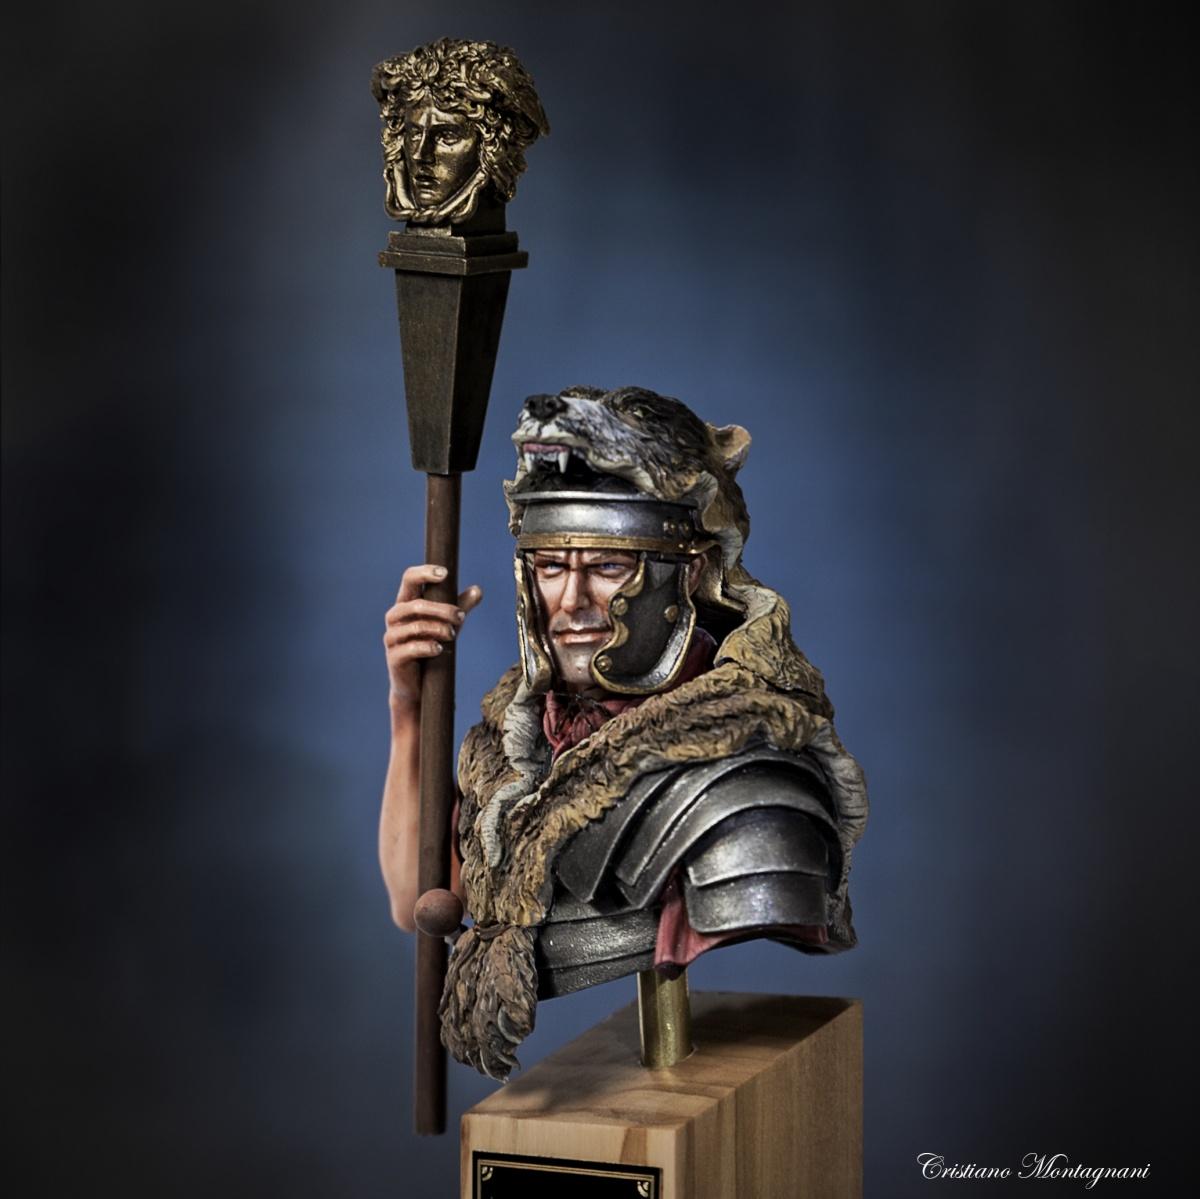 Roman Legionary - Bible History Online